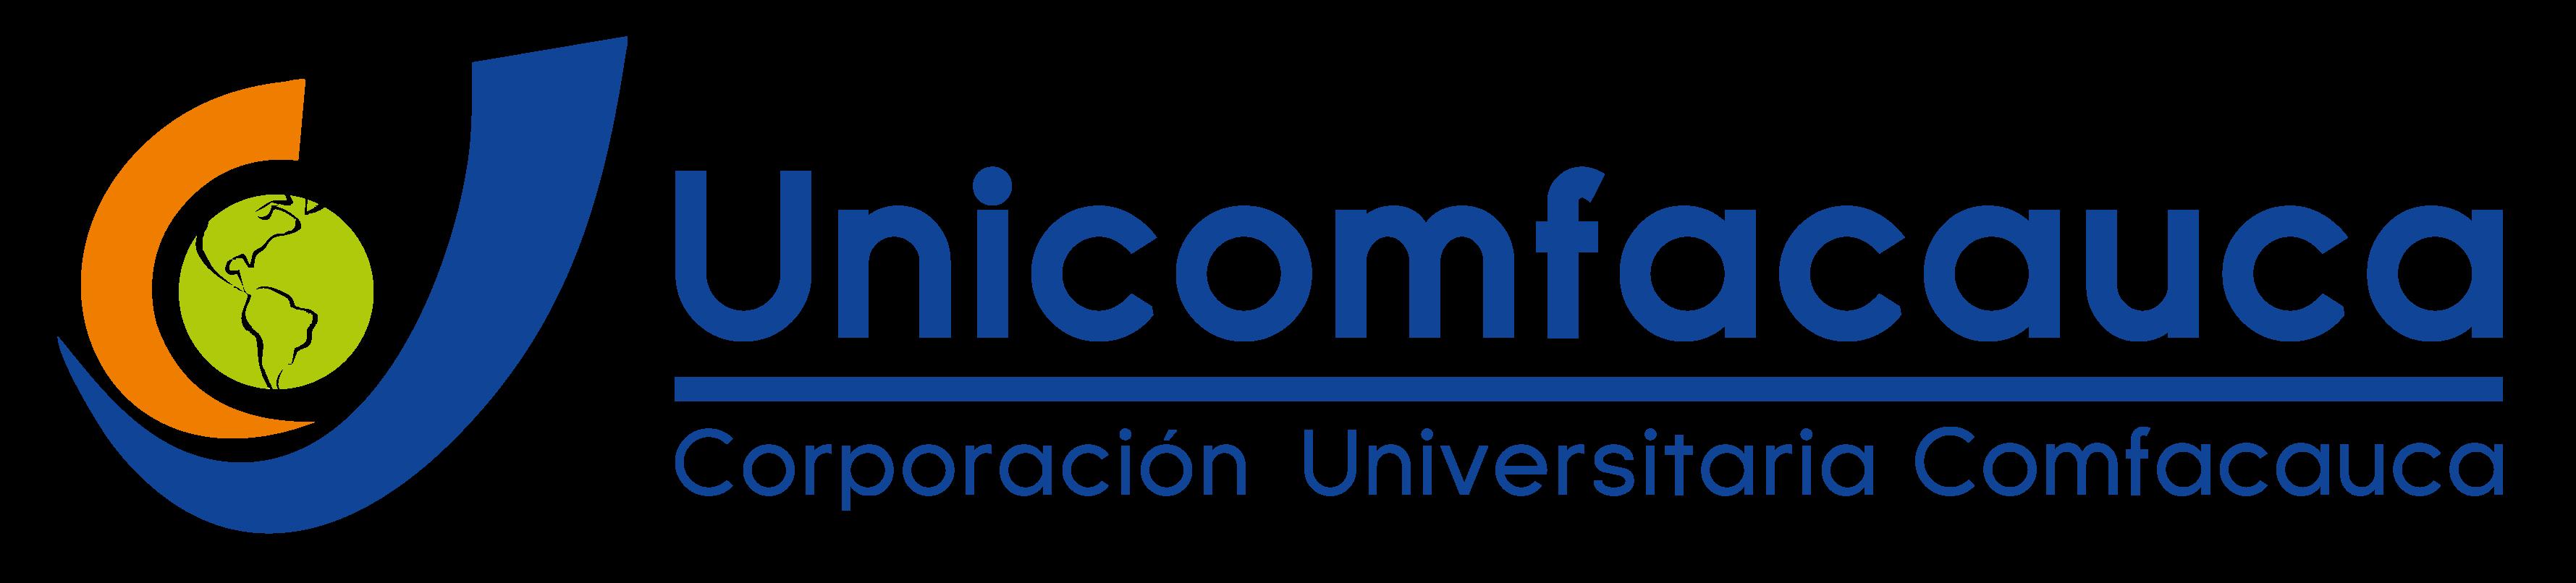 http://www.unicomfacauca.edu.co/